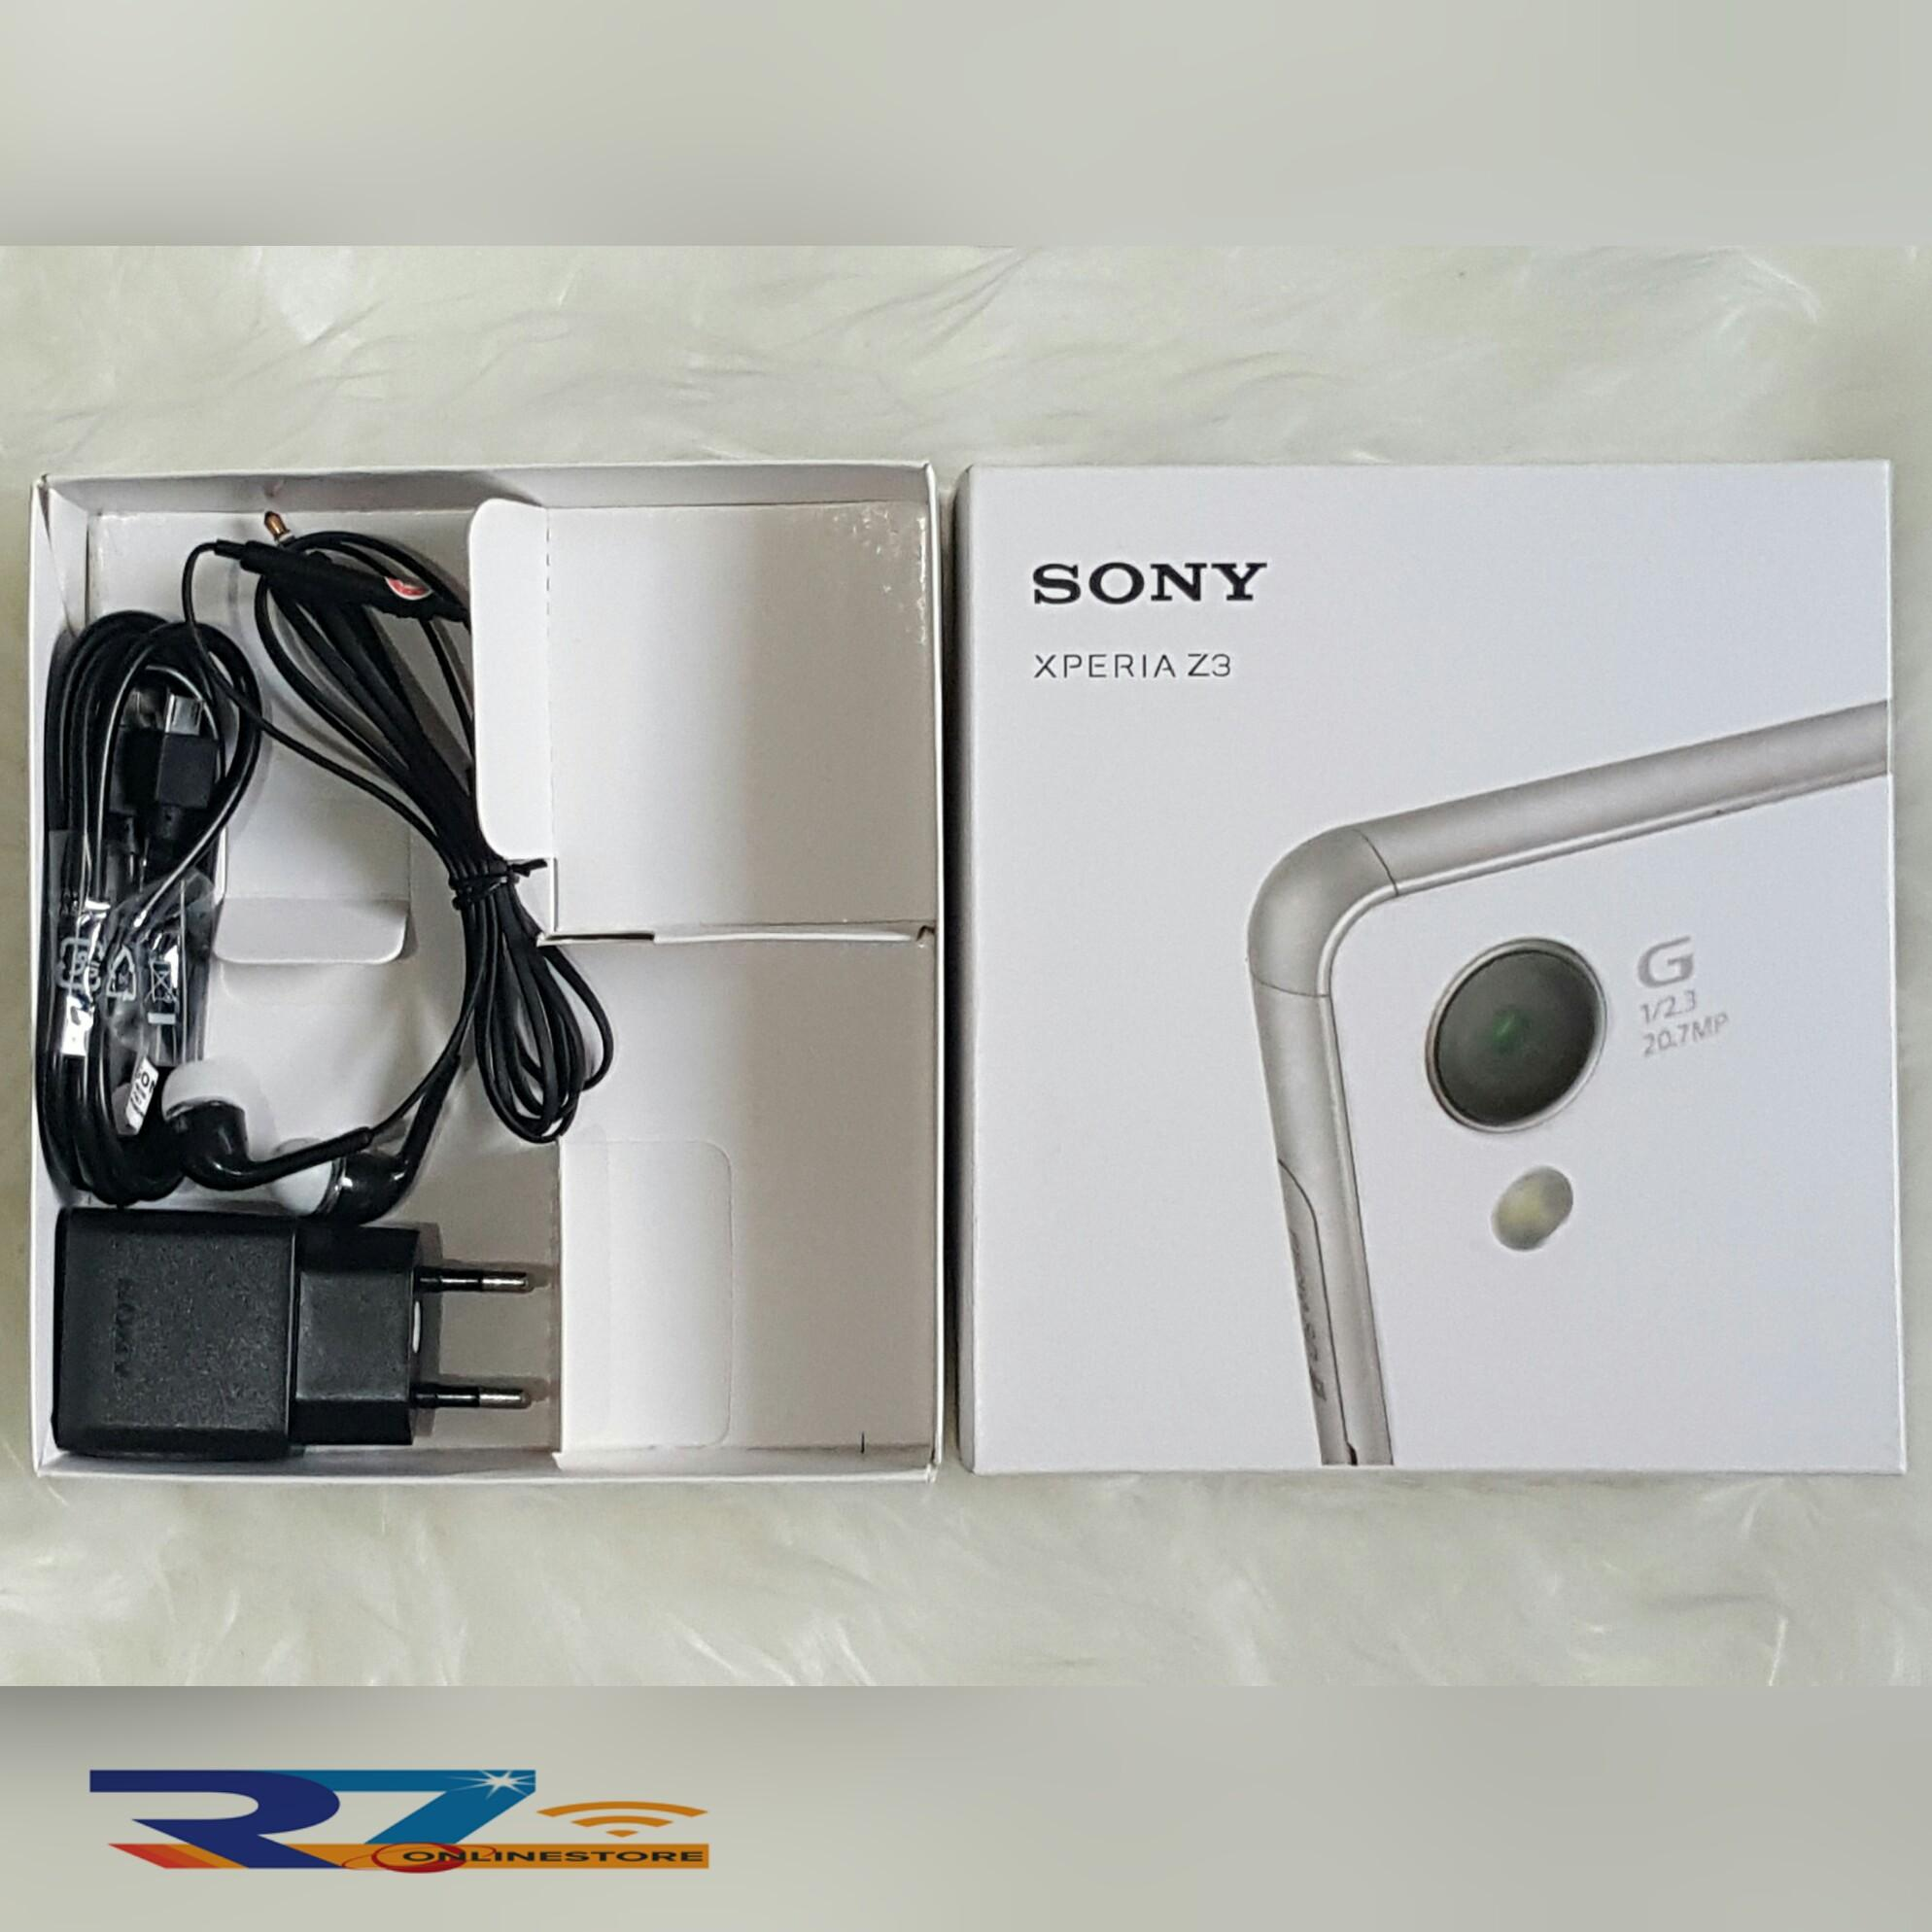 Kelebihan Dus Sony Xperia Z3 Compact Terkini Daftar Harga Dan Tempered Glass Anti Gores Kaca Mini Box Kotak Full Set